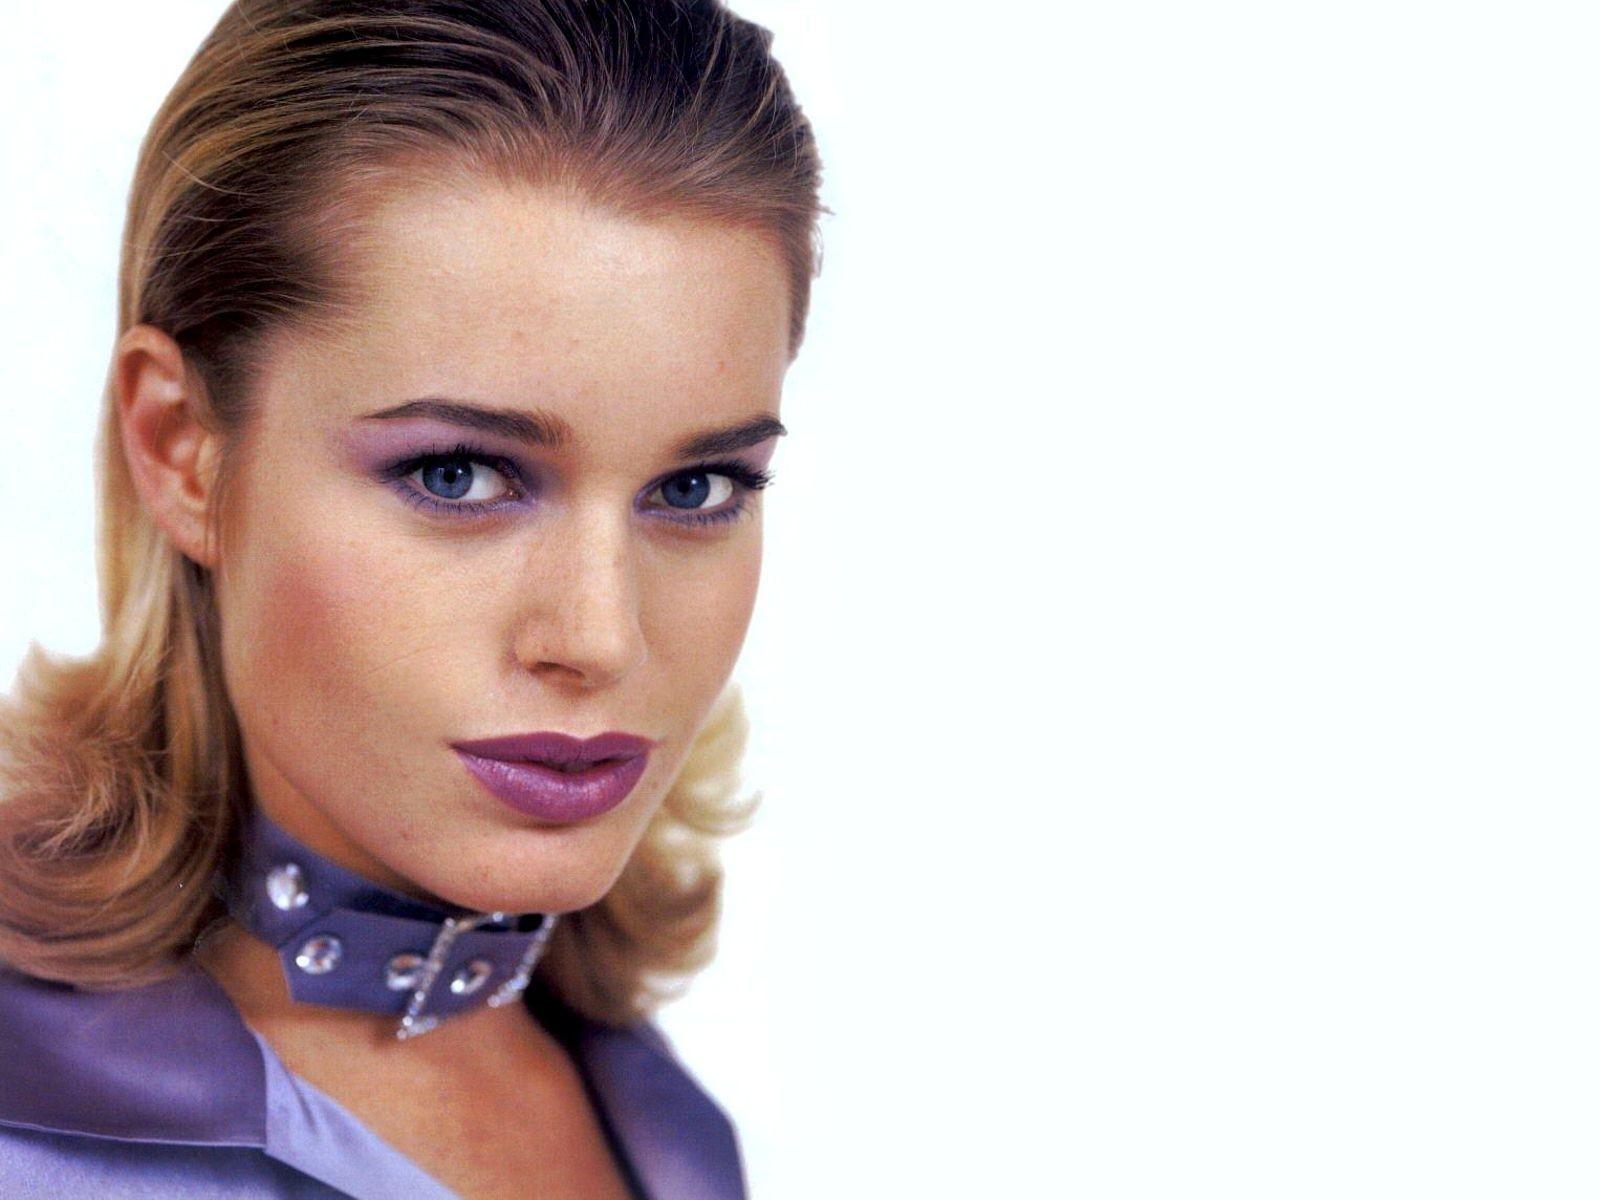 Wallpaper: make-up violaceo per Rebecca Romijn